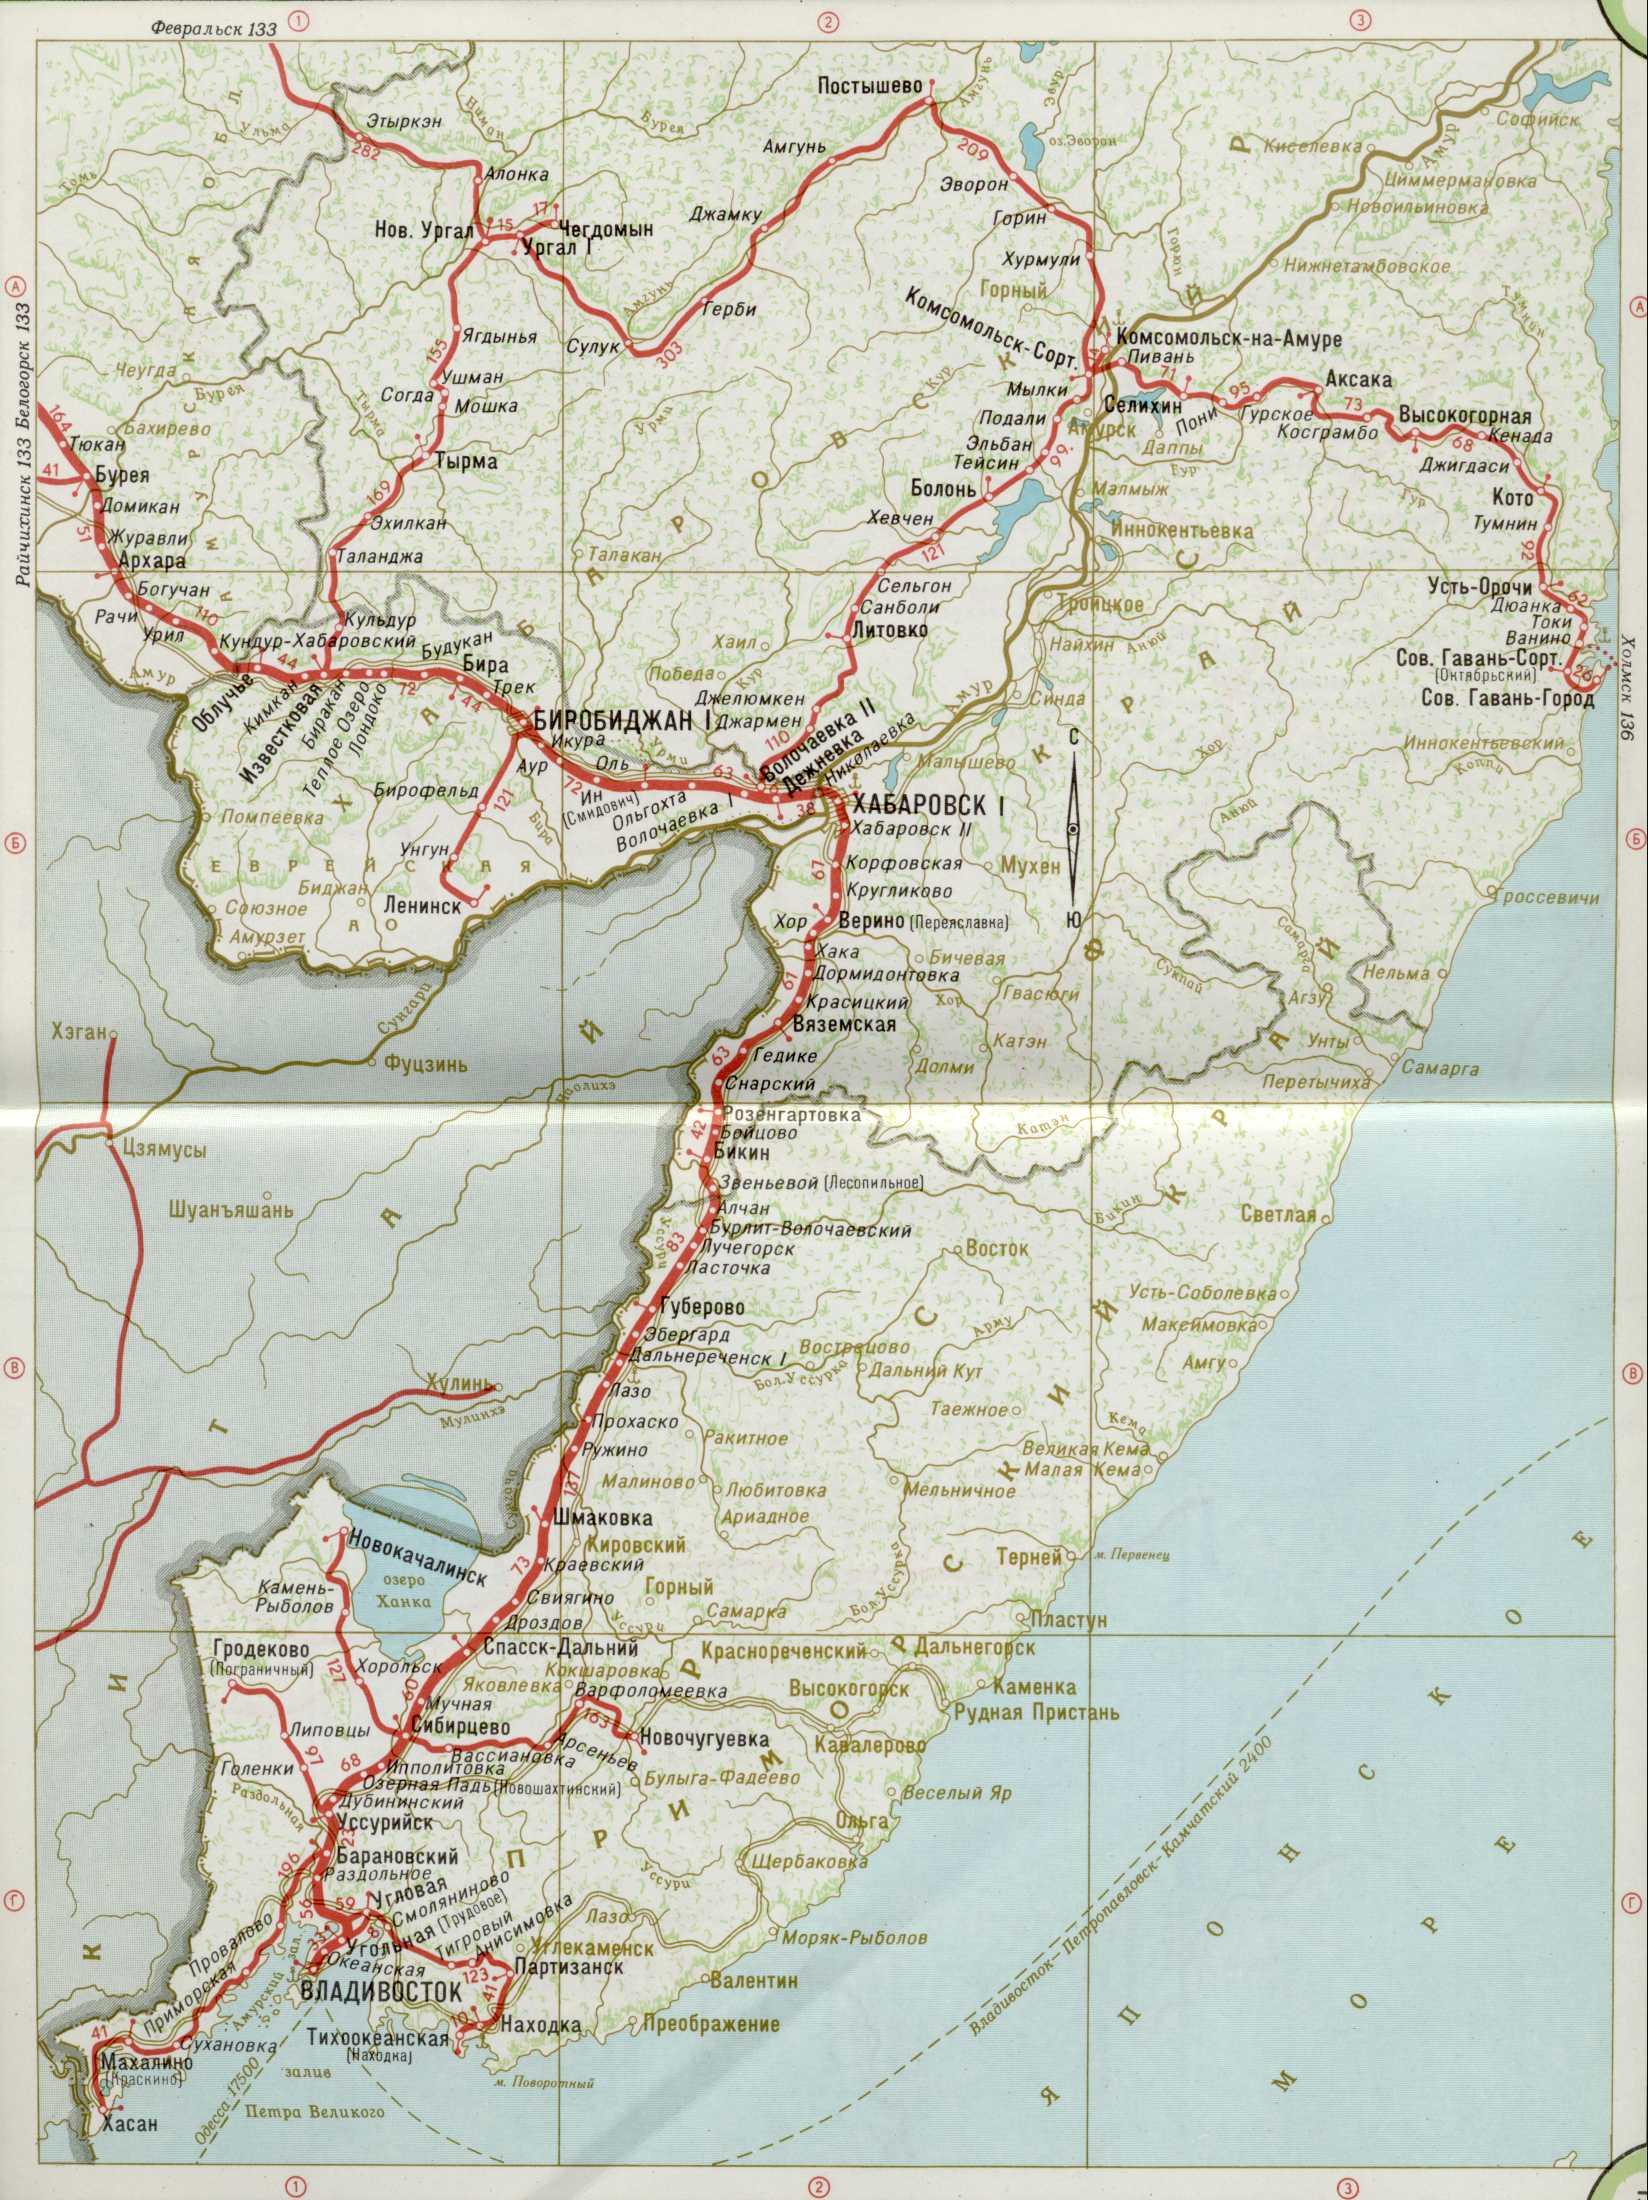 Карты Железных Дорог Украины